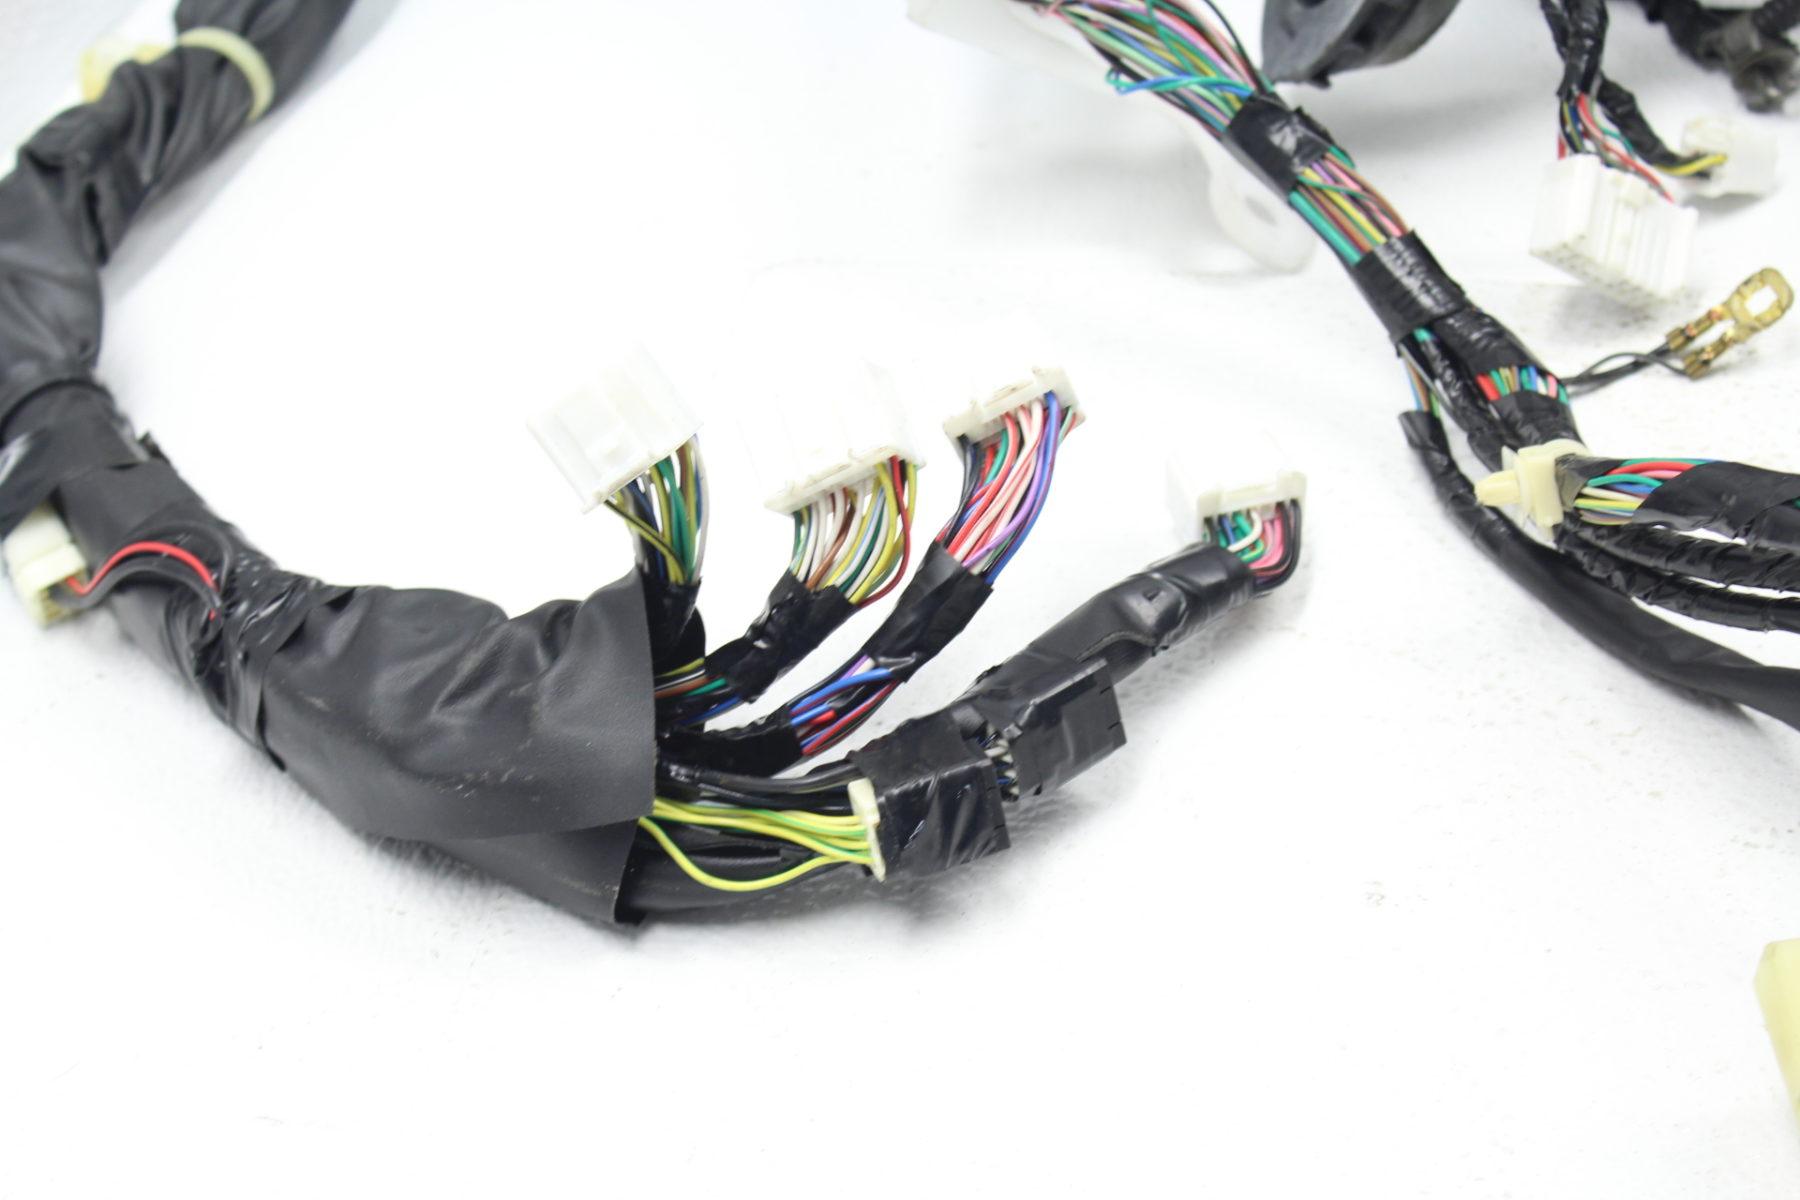 2008 subaru impreza wrx sti hatch dashboard bulk wire. Black Bedroom Furniture Sets. Home Design Ideas